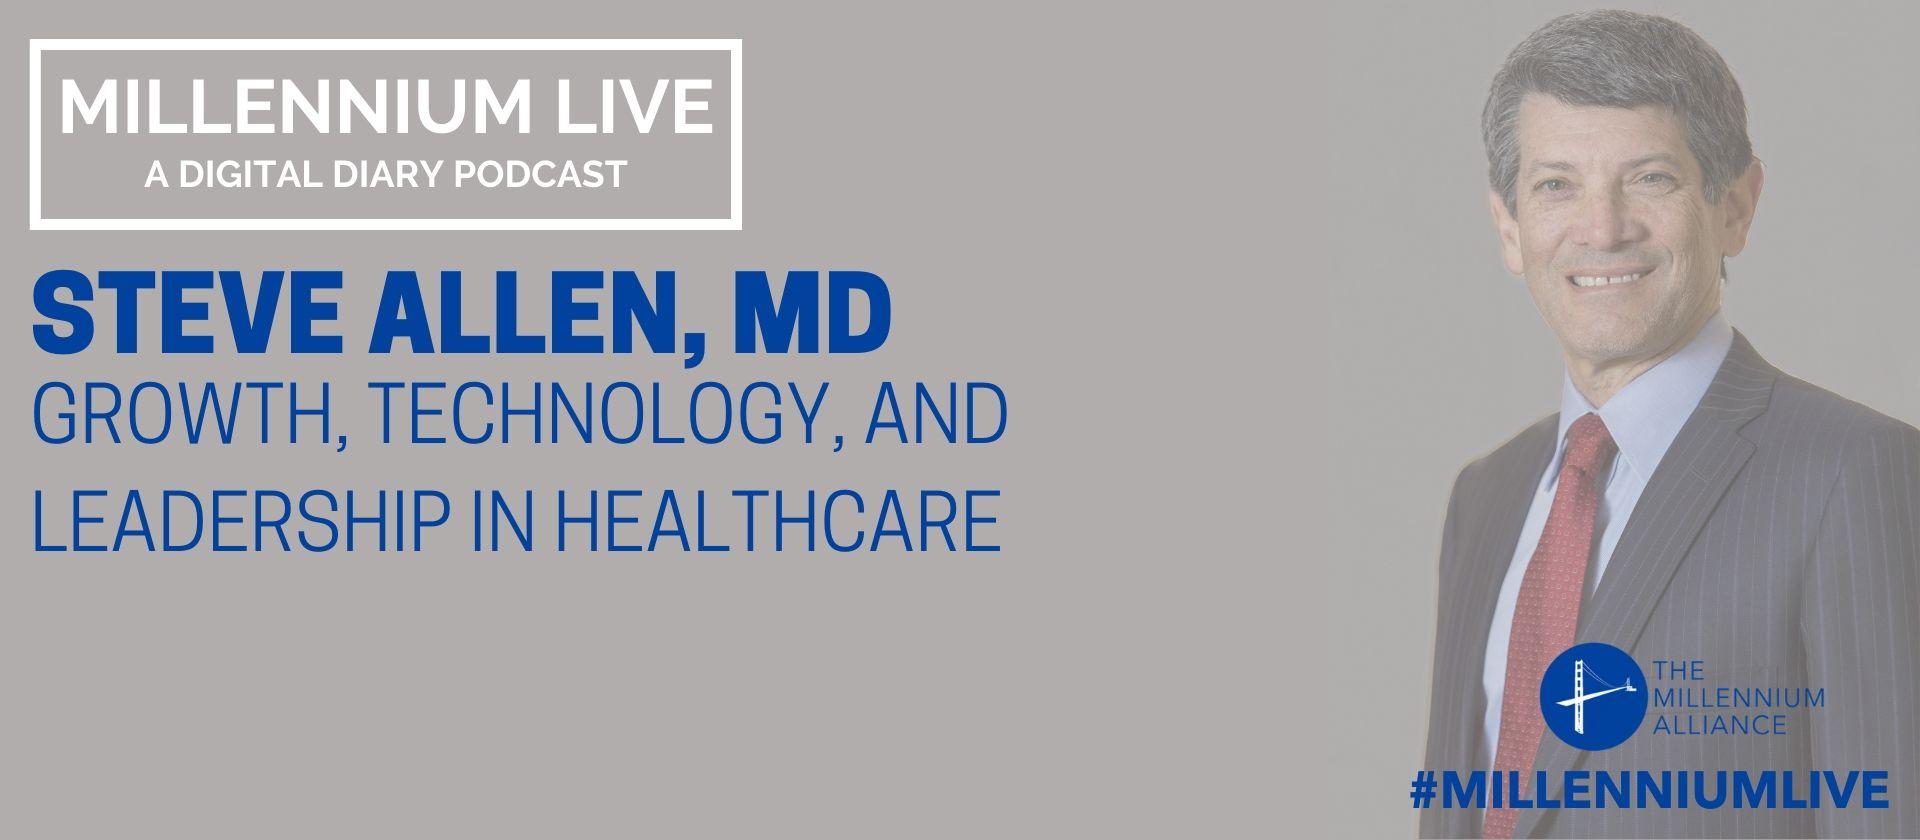 Steve Allen Technology in Healthcare Podcast Millennium Alliance